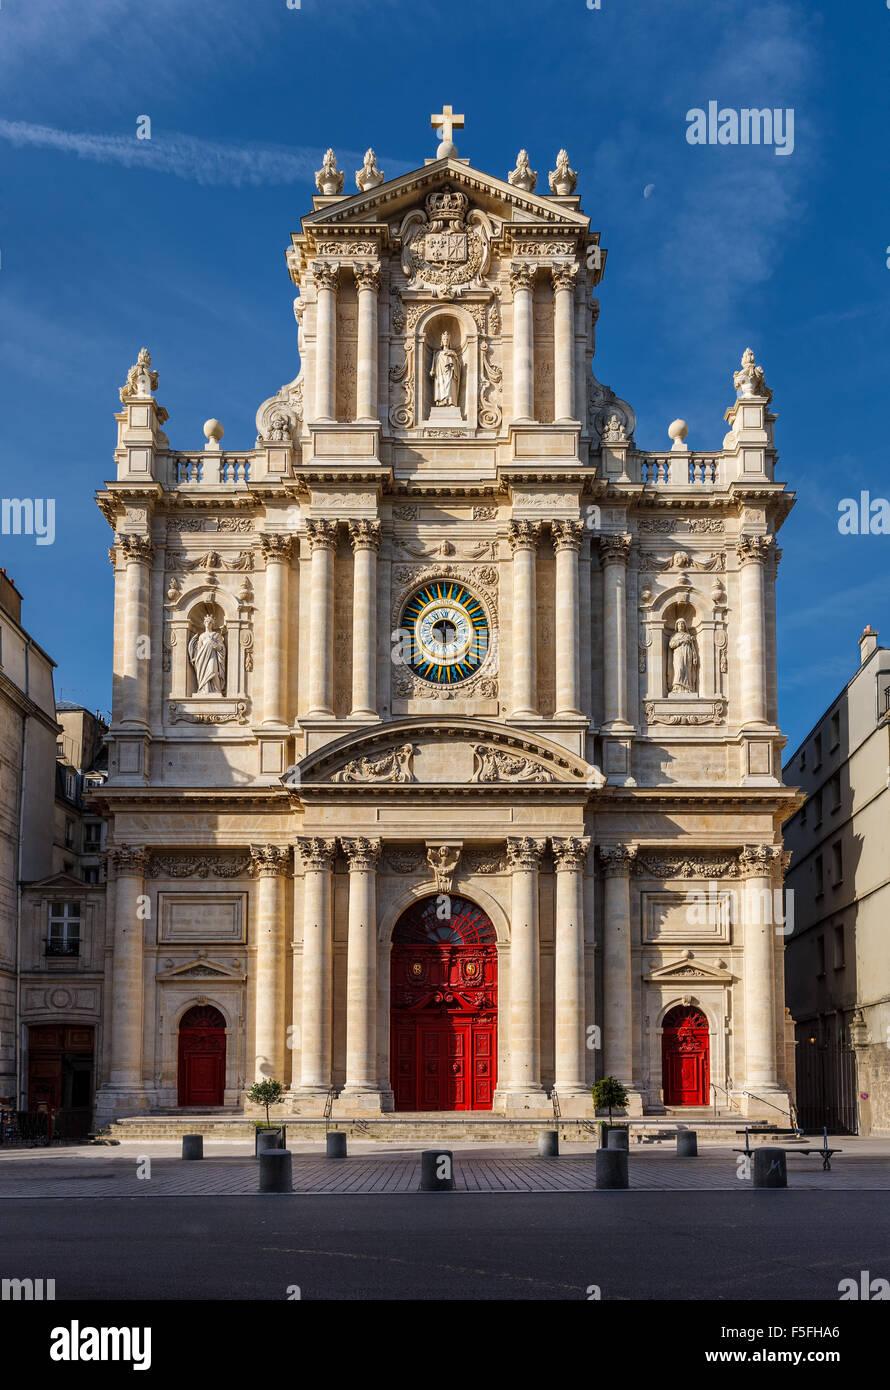 Fachada de la iglesia de Saint-Paul-Saint-Louis en el barrio de Marais (4º arrondissement) de París, Francia. Foto de stock